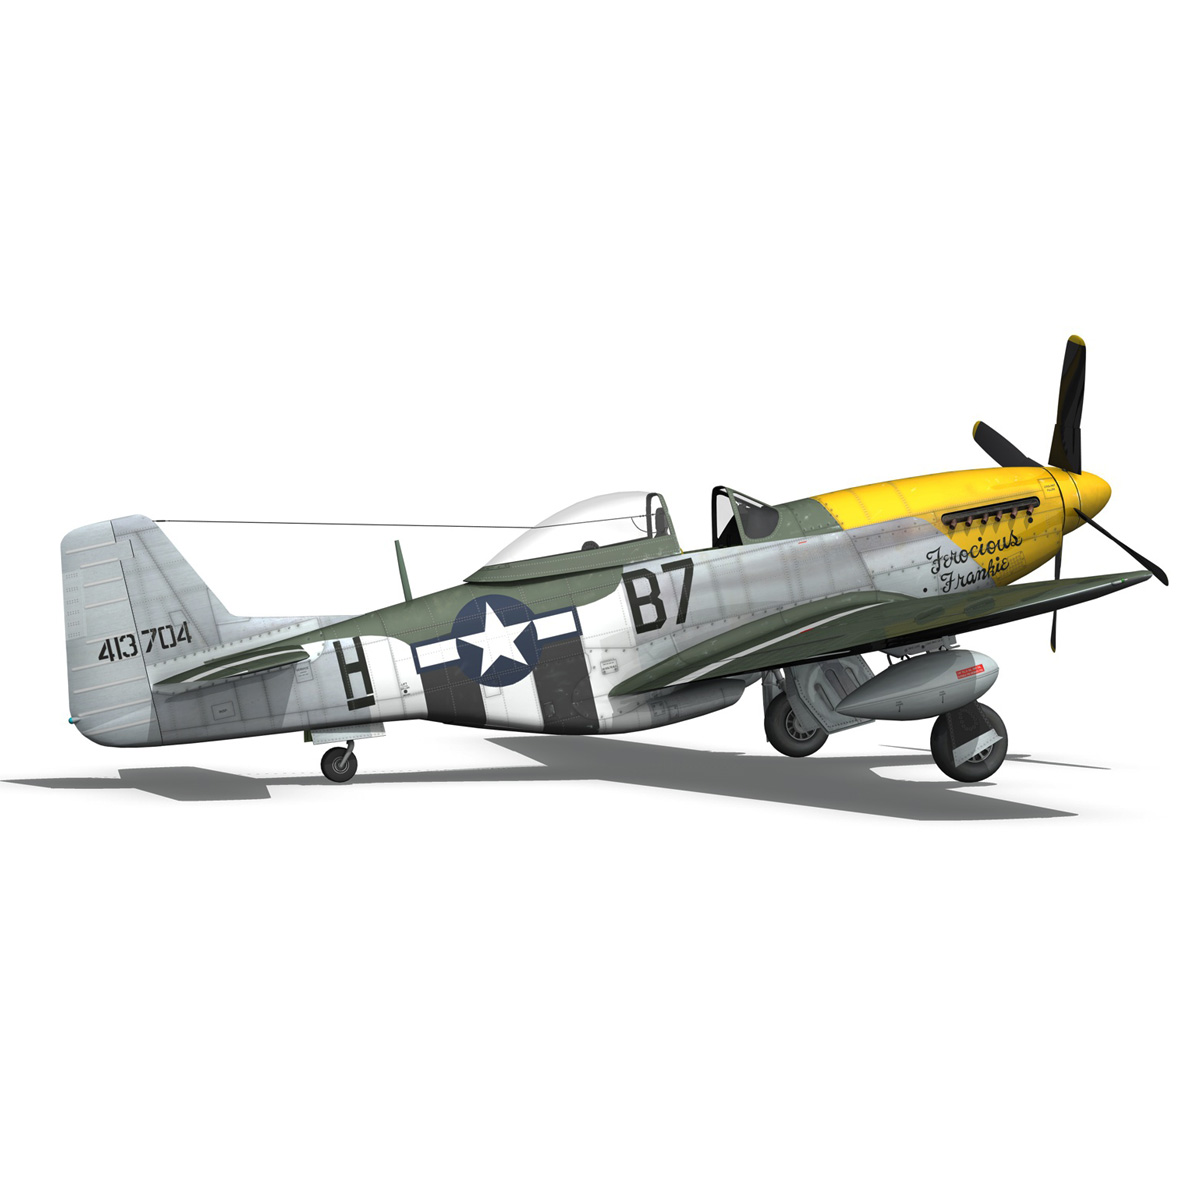 north american p-51d mustang – ferocious frankie 3d model fbx c4d lwo obj 269498